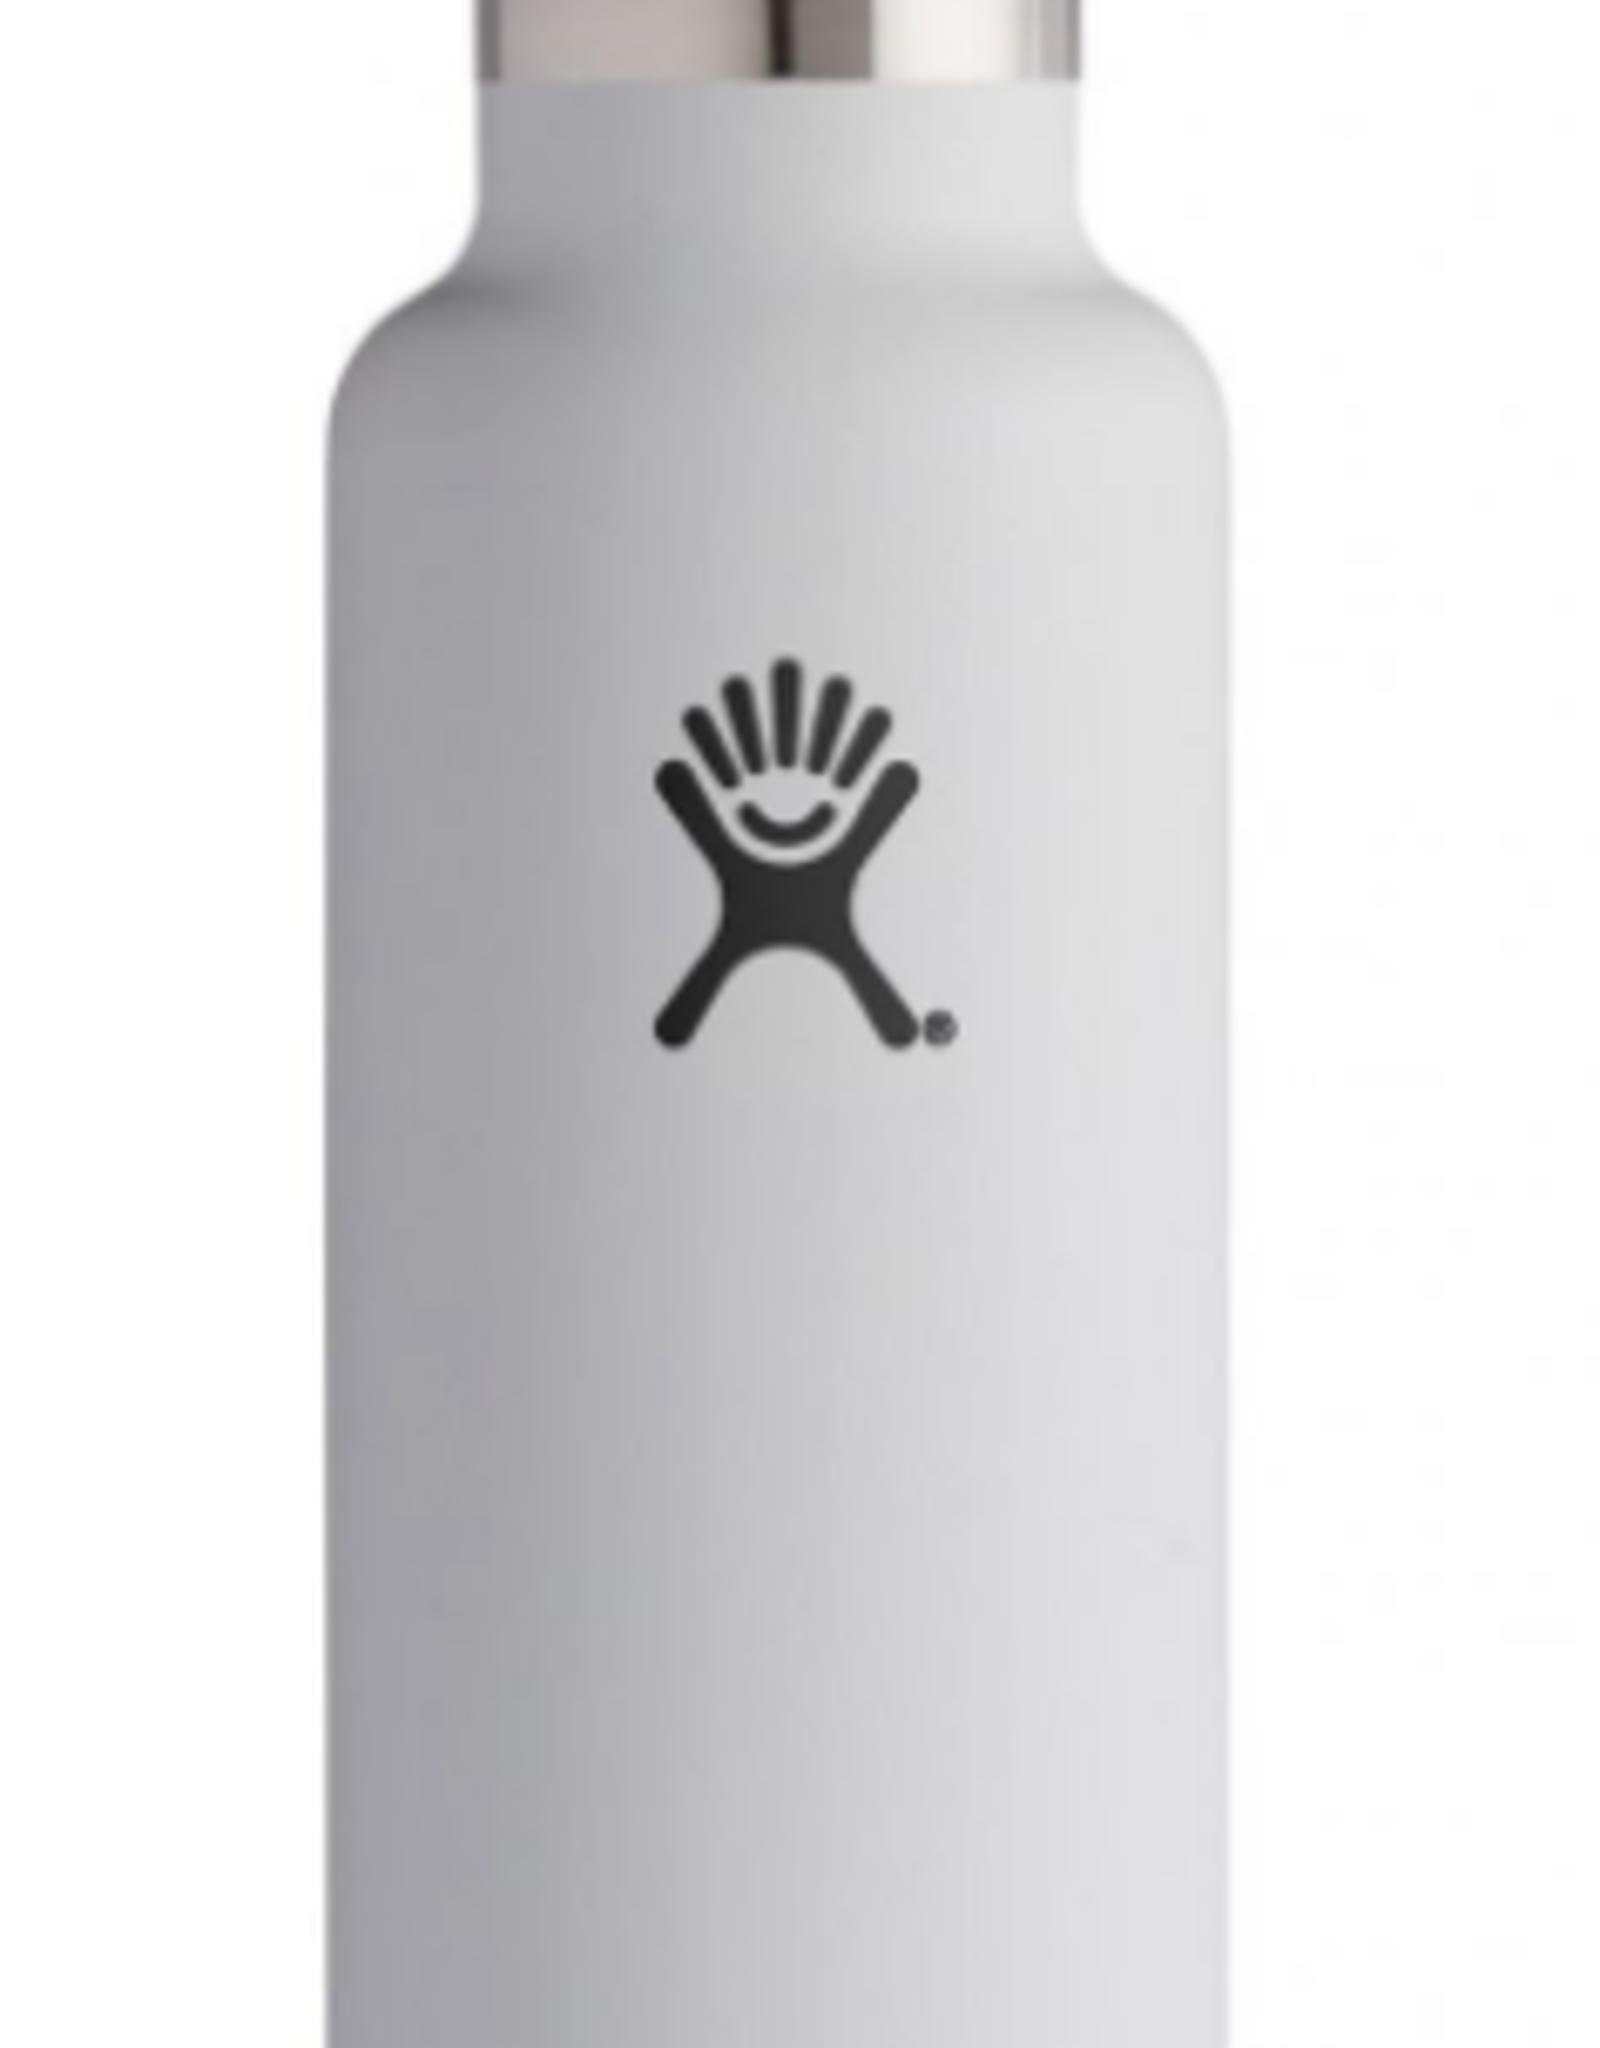 HYDRO FLASK Hydro Flask Standard Mouth 21 oz -